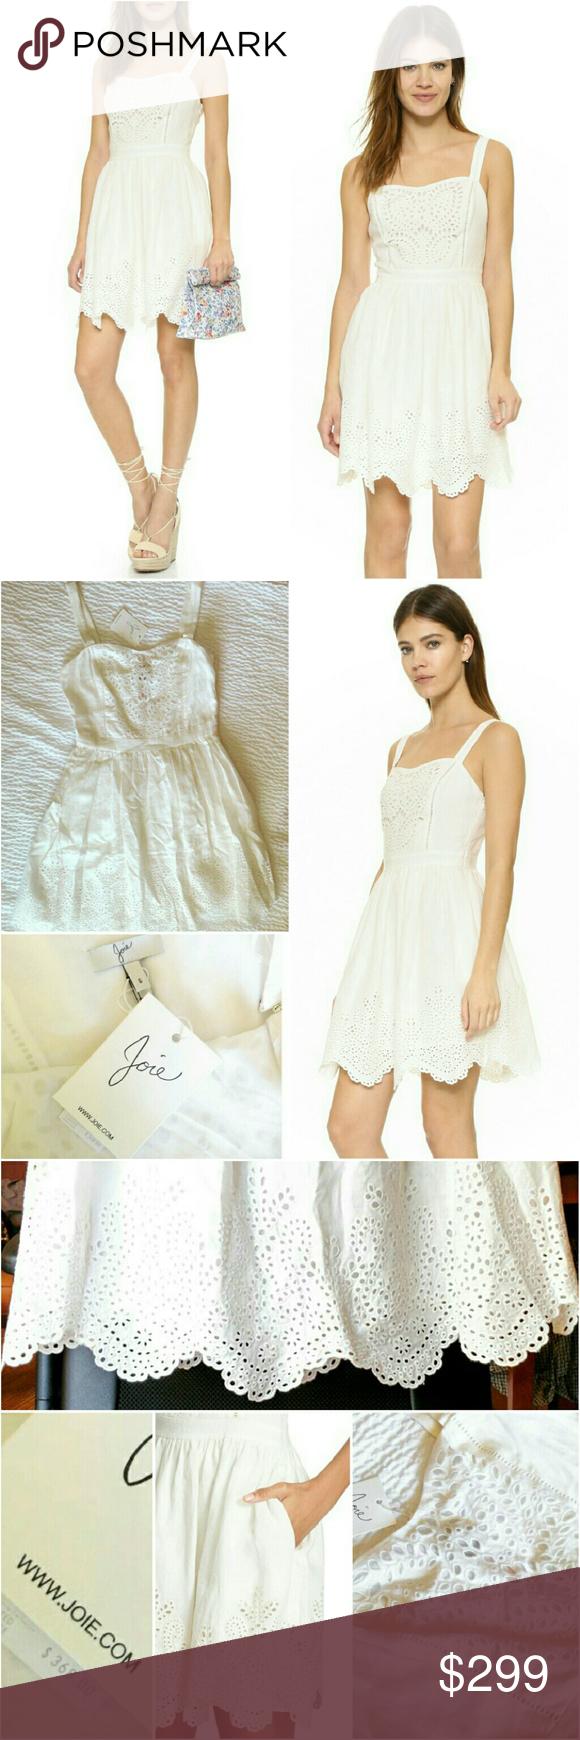 a1446e16c0 Joie Ornata Eyelet Linen Fit   Flare Dress ✨Retails at  368++tax ⏩A  charming linen Joie dress with feminine sweetheart neckline   scalloped hem  ...